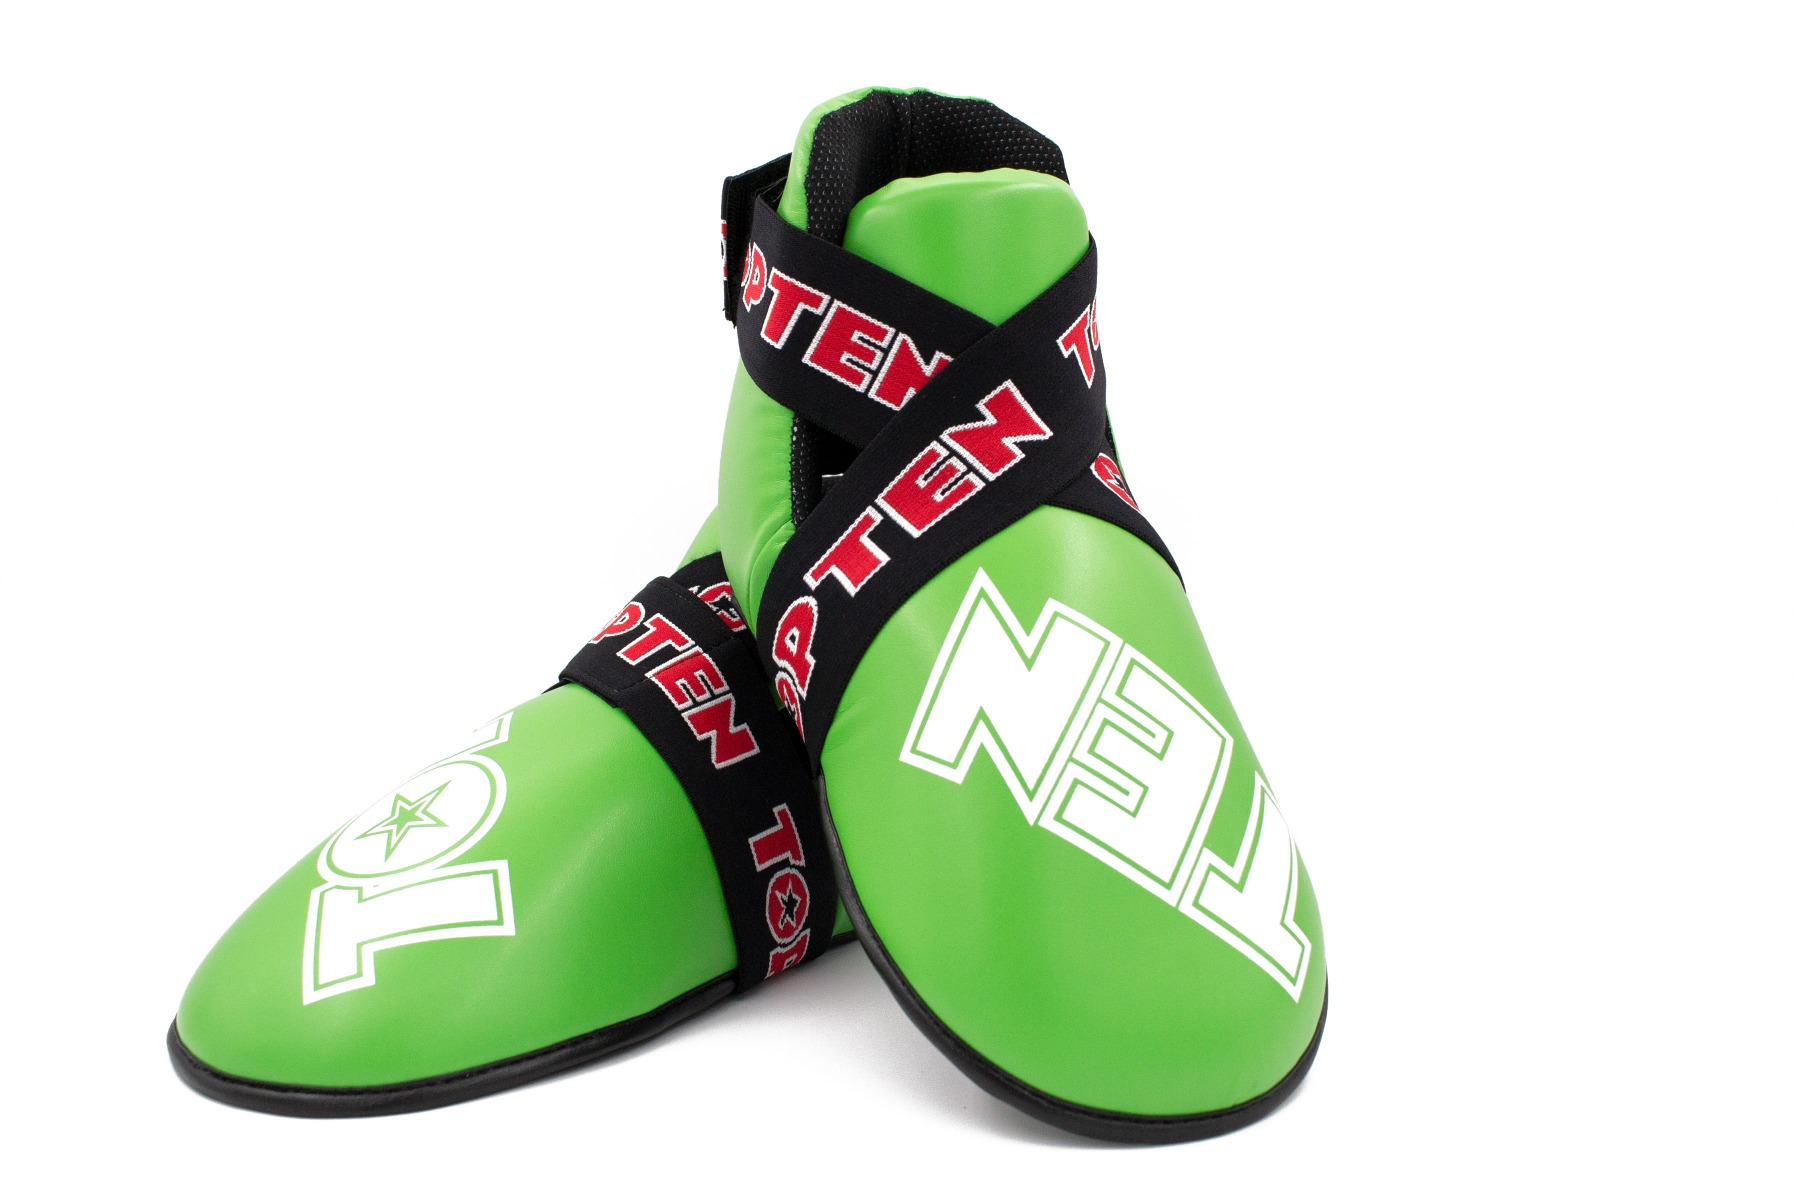 Kicks Superlight Grün